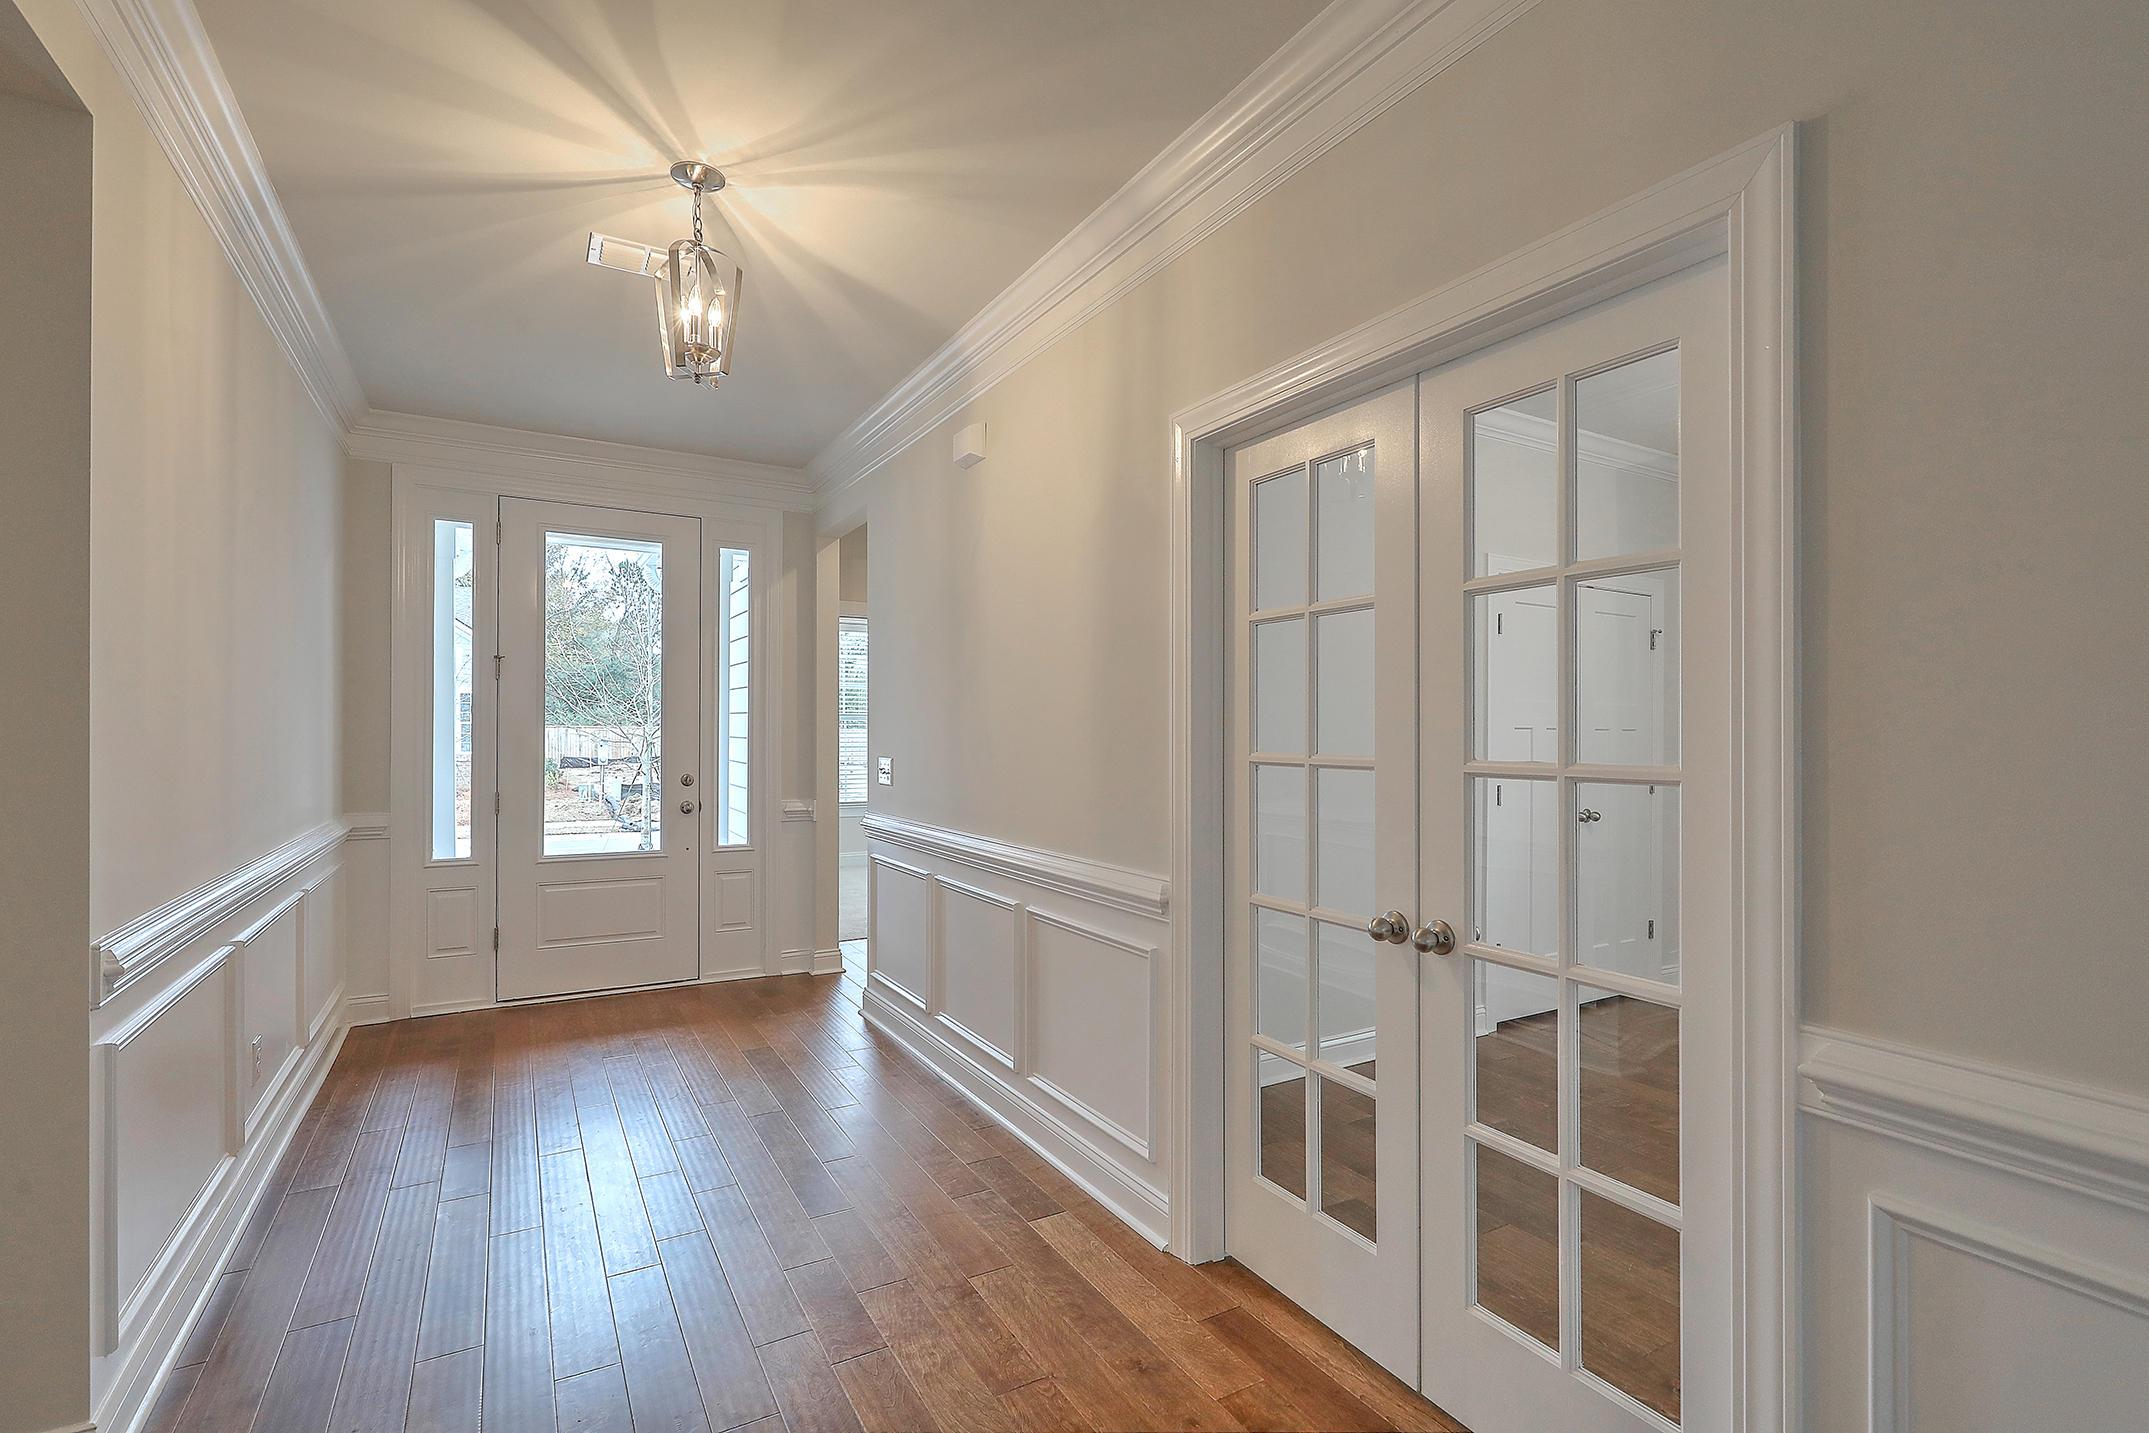 Bentley Park Homes For Sale - 1265 Gannett, Mount Pleasant, SC - 20